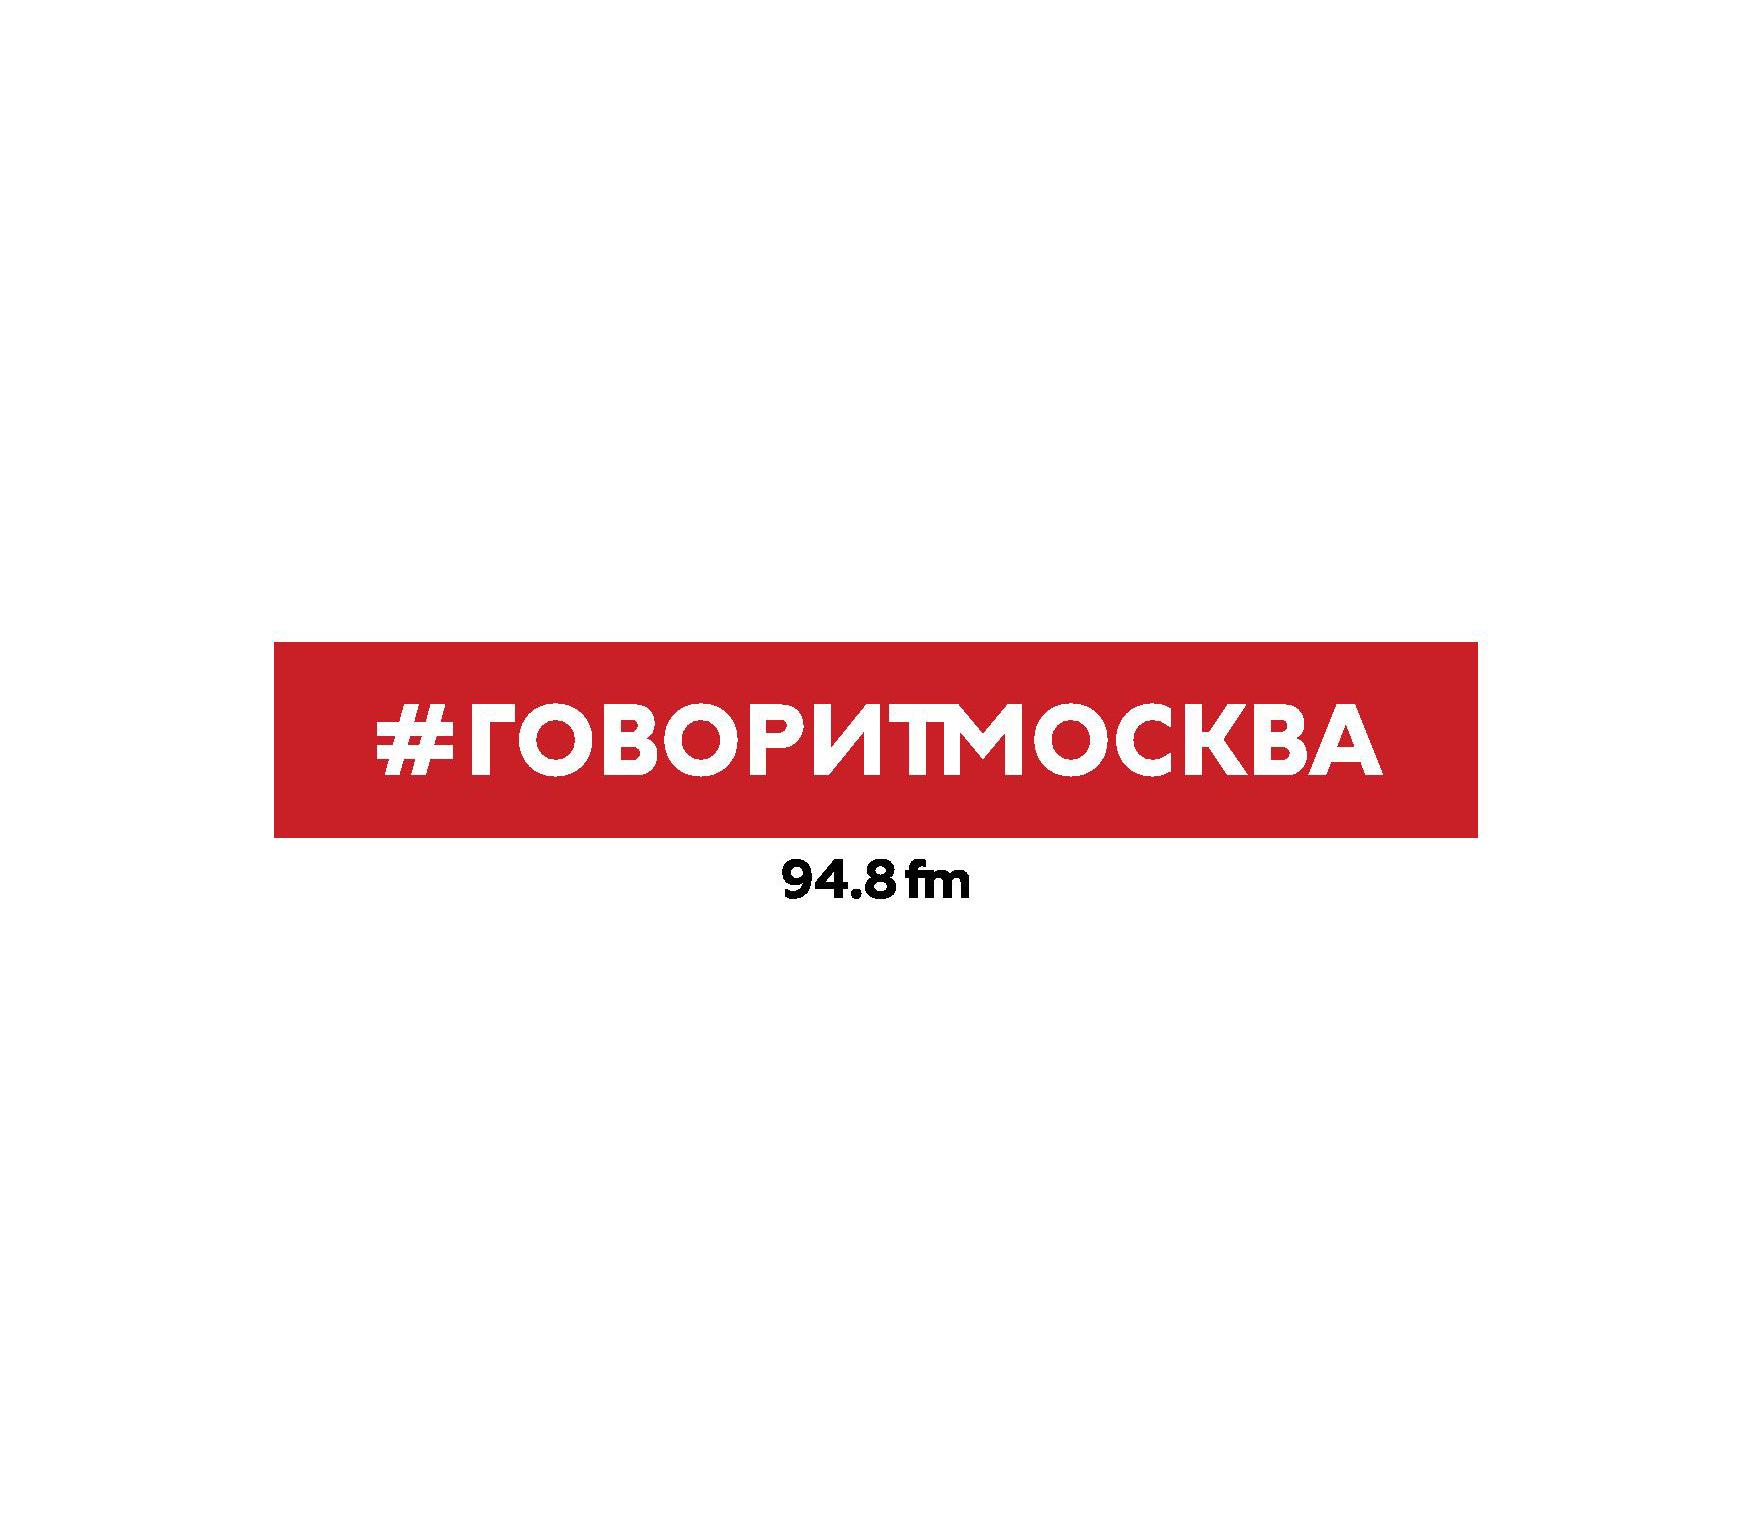 Макс Челноков 23 марта. Авигдор Эскин макс челноков 5 мая марат гельман